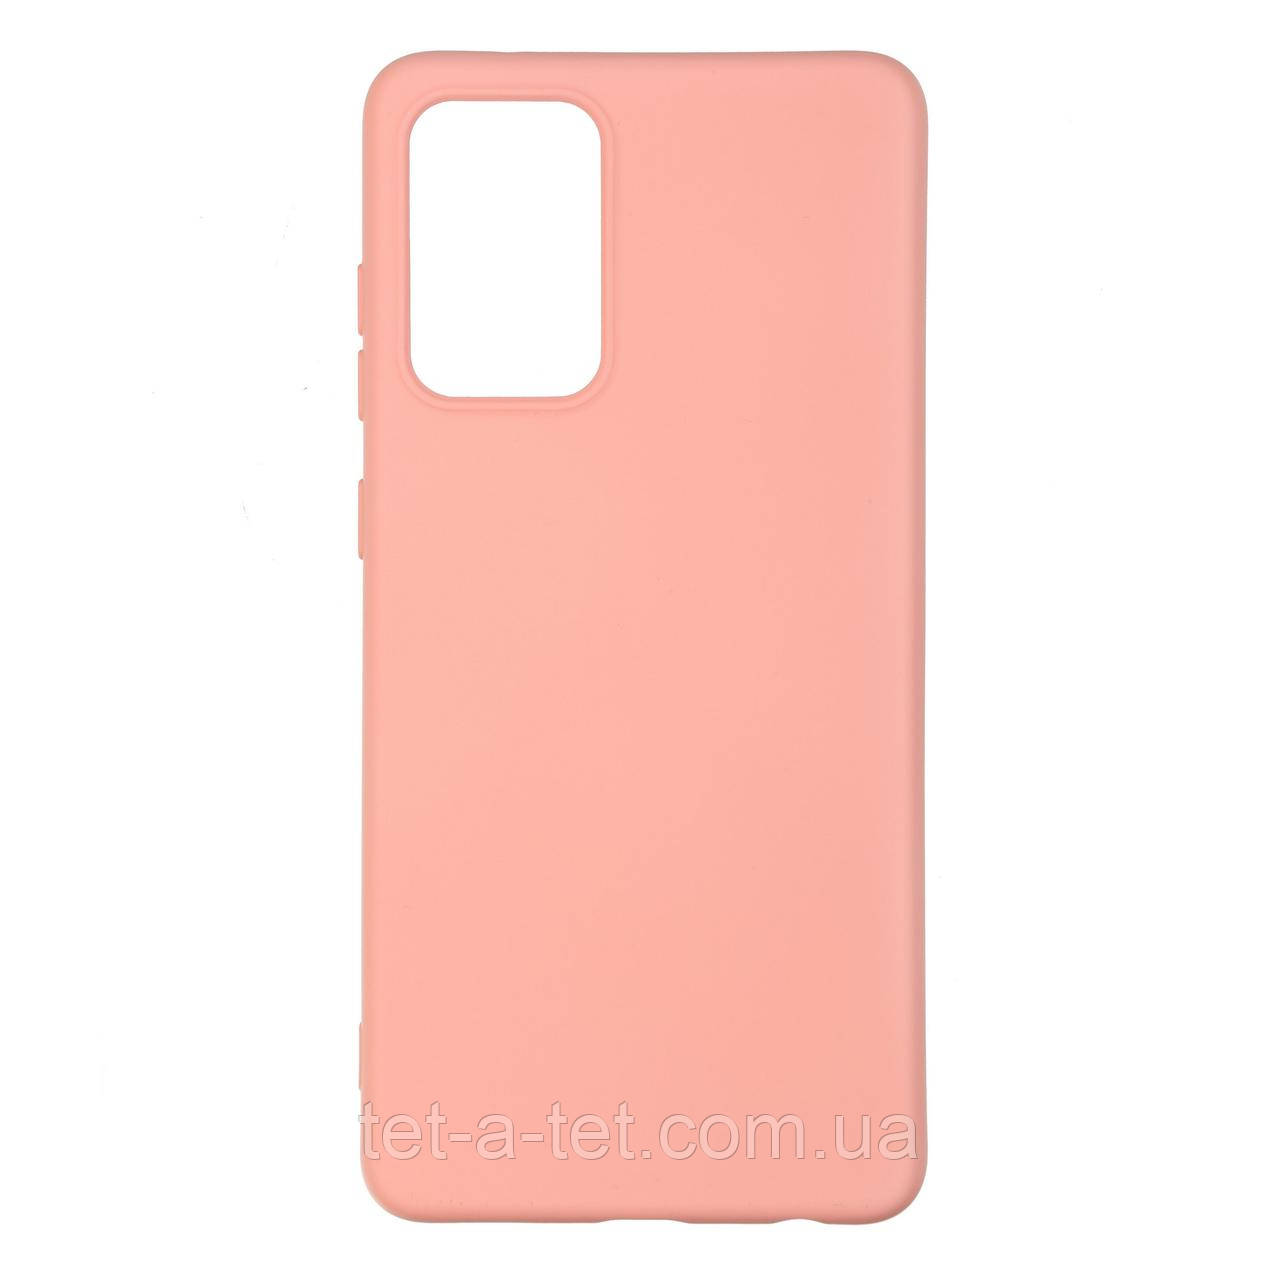 Чохол силіконовий ArmorStandart ICON Case for Samsung A52 (A525) Pink